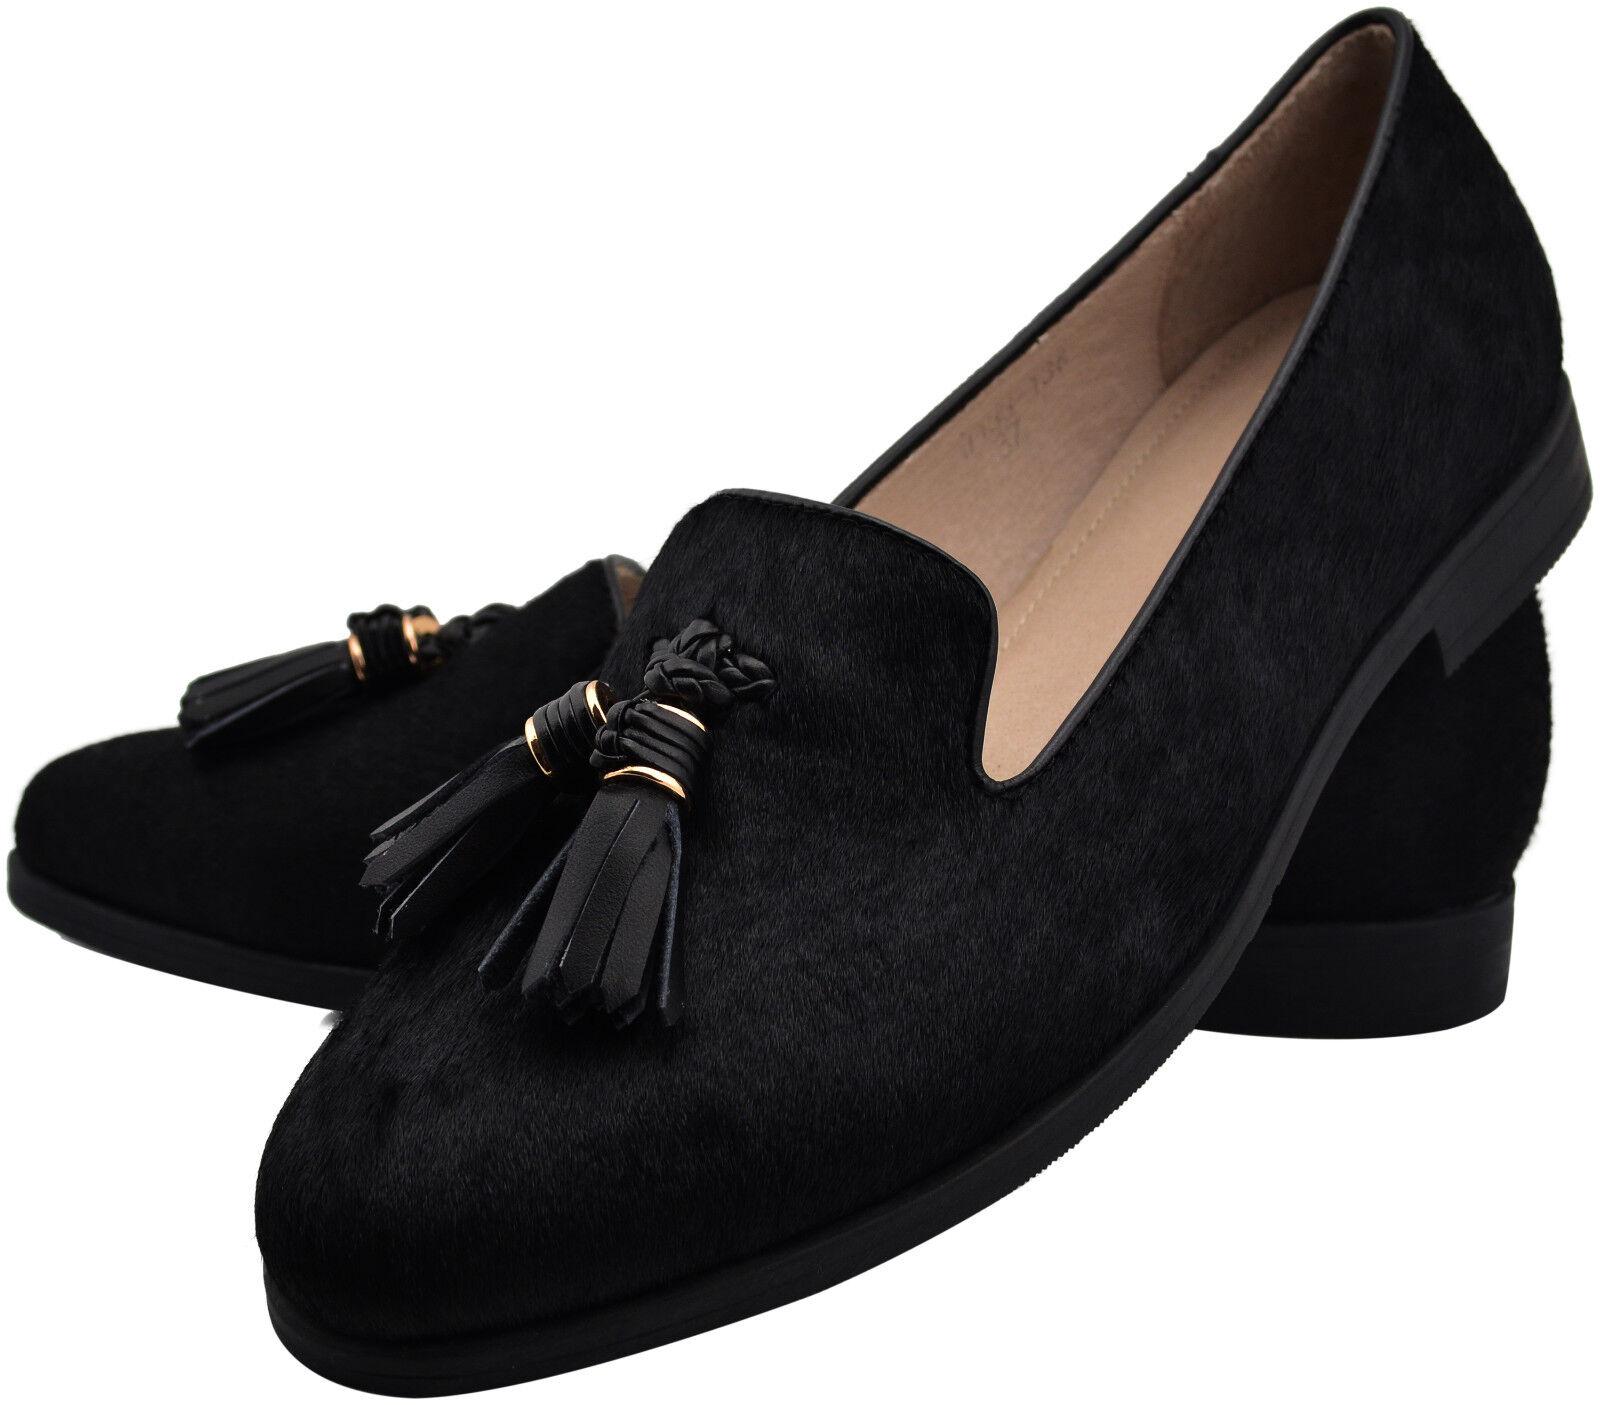 Loafer cuero cuero cuero tasselloafer negro fell borlas tassels par individuales tamaño 36  para mayoristas